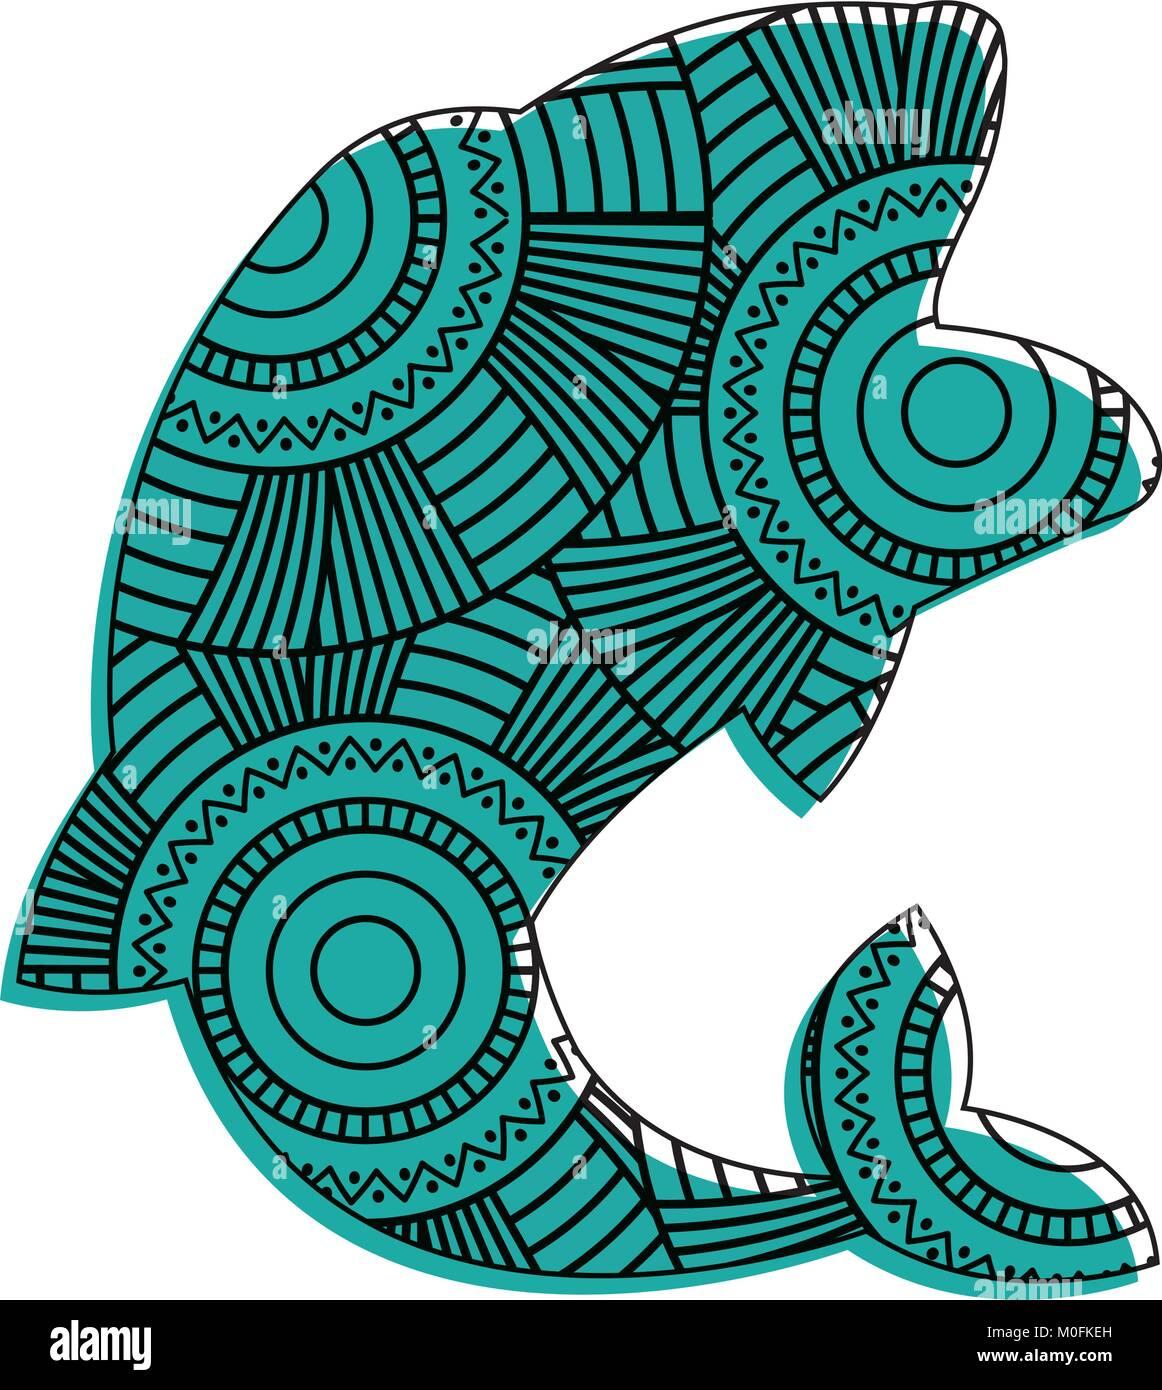 Whale Drawing Imágenes De Stock & Whale Drawing Fotos De Stock - Alamy